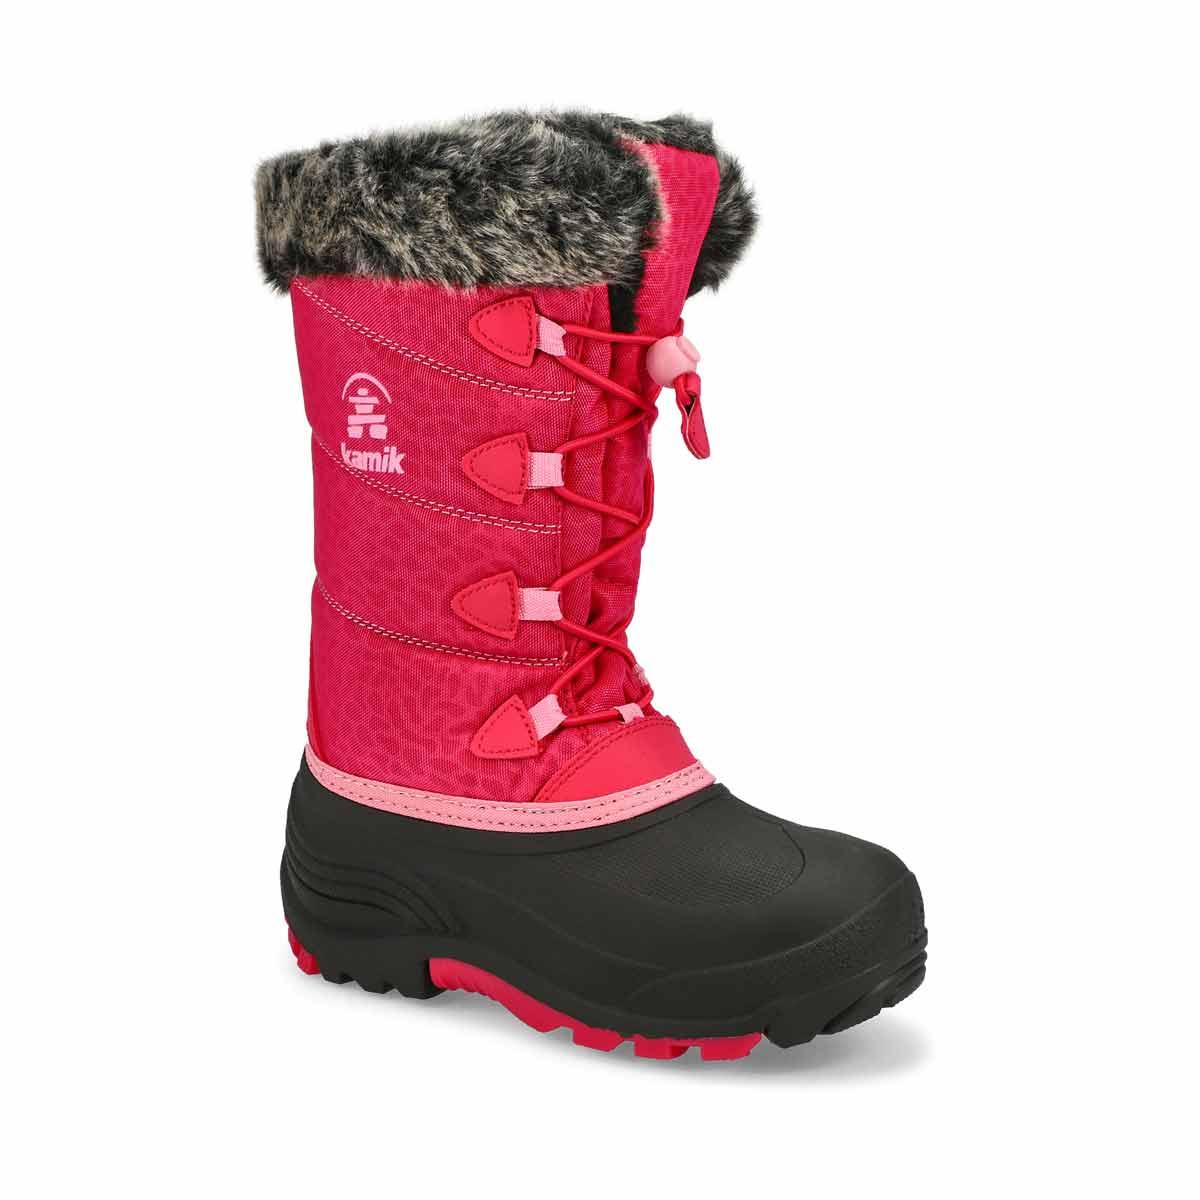 Grls Snowgypsy 3 rose wtpf winter boot